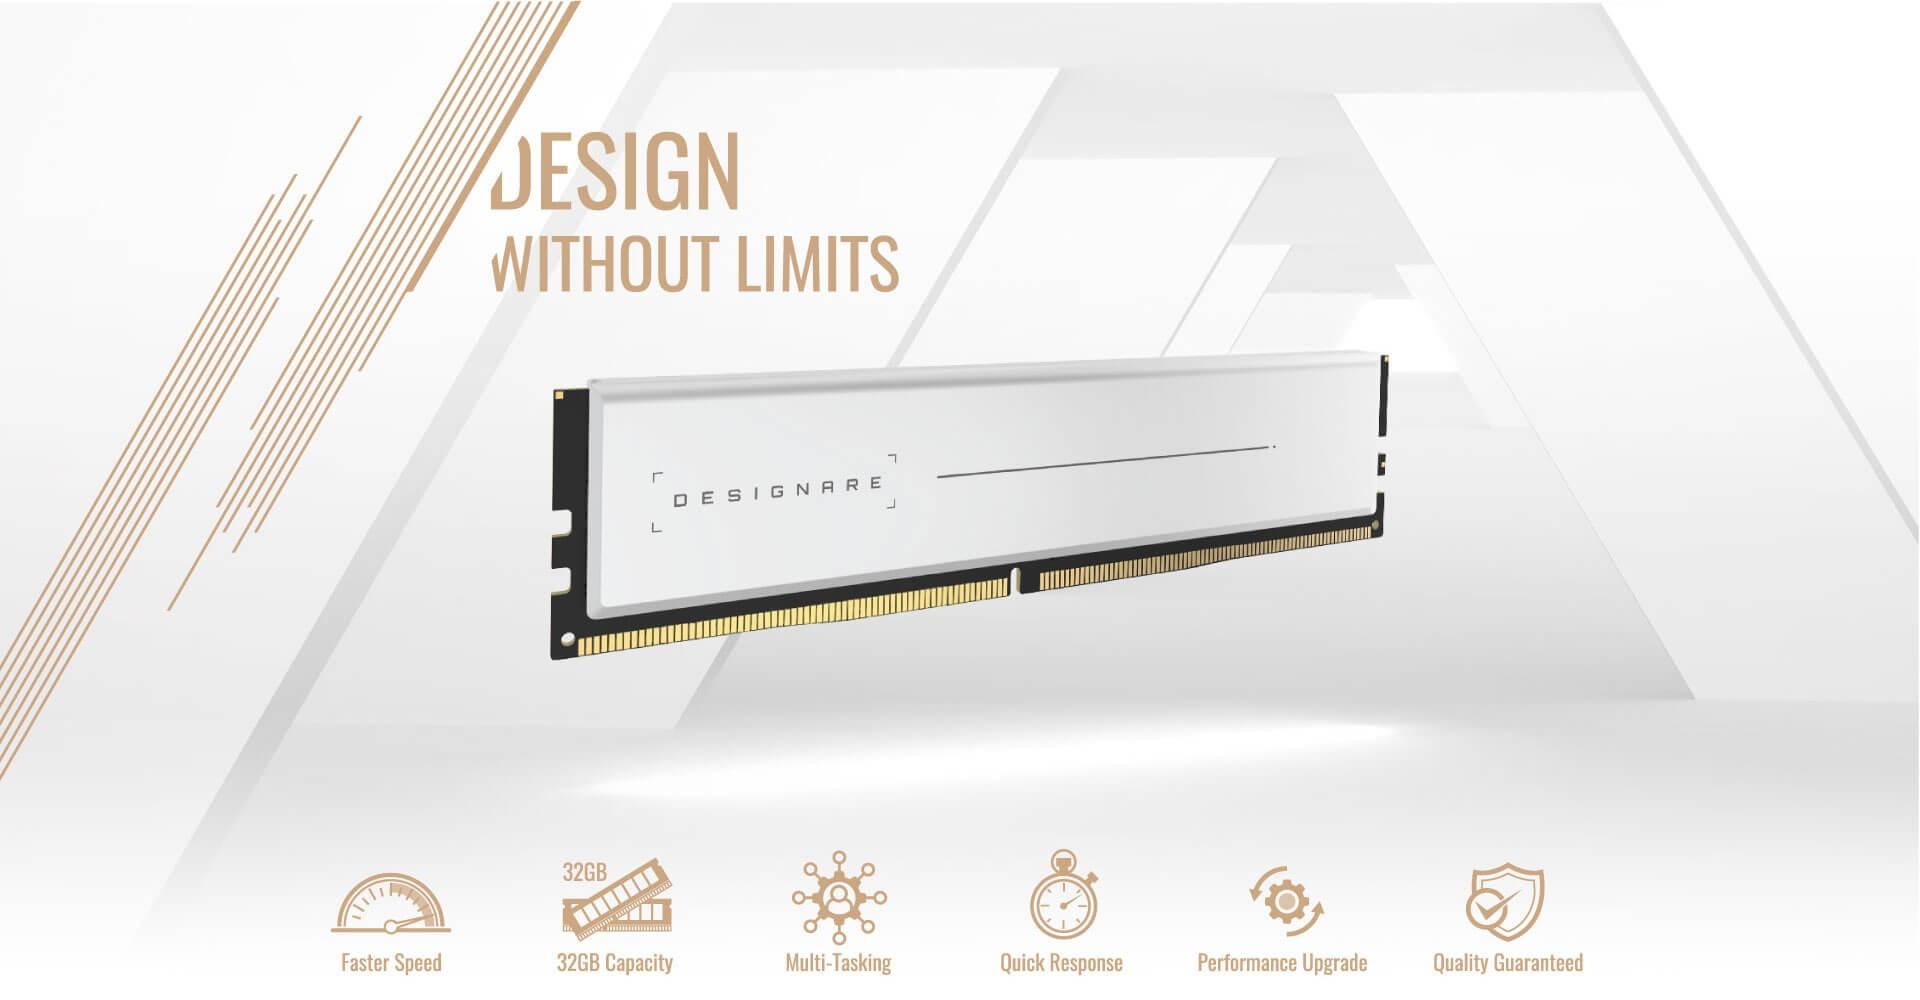 Ram Gigabyte DESIGNARE Memory 64GB 3200MHz